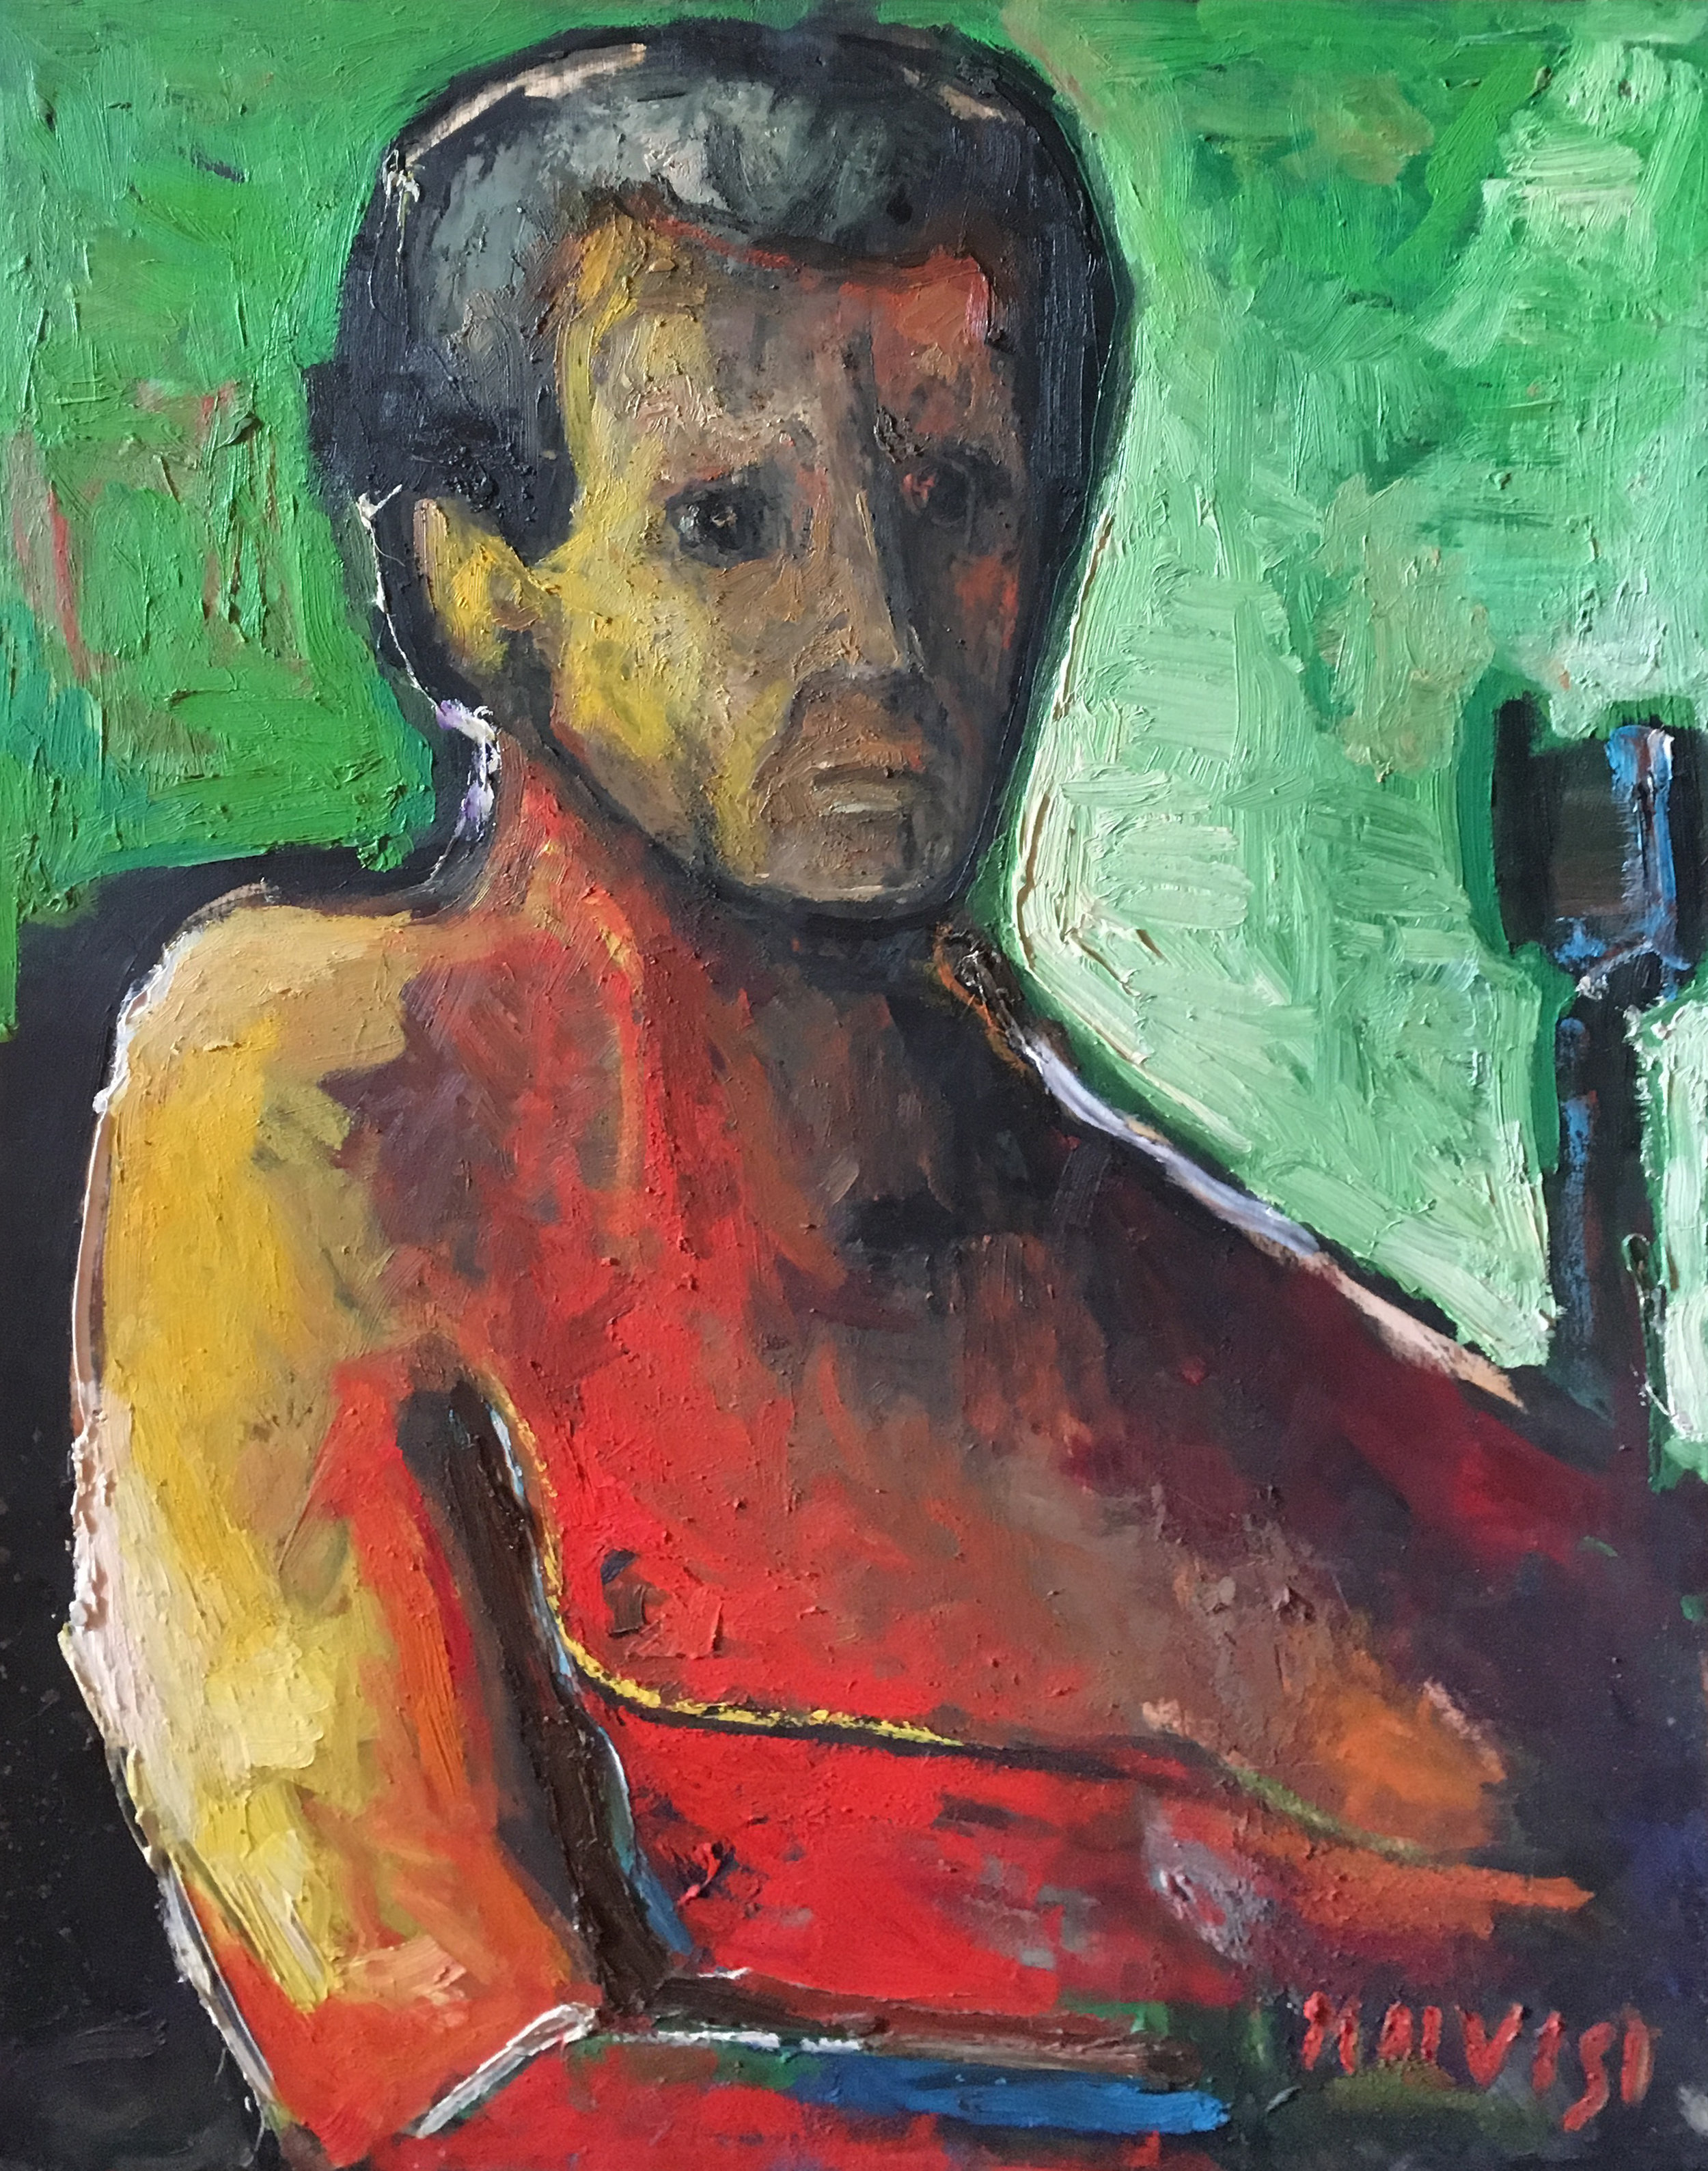 <b>Guglielmo</b><br> 1981 Oil on wood <br> cm 50 x 70